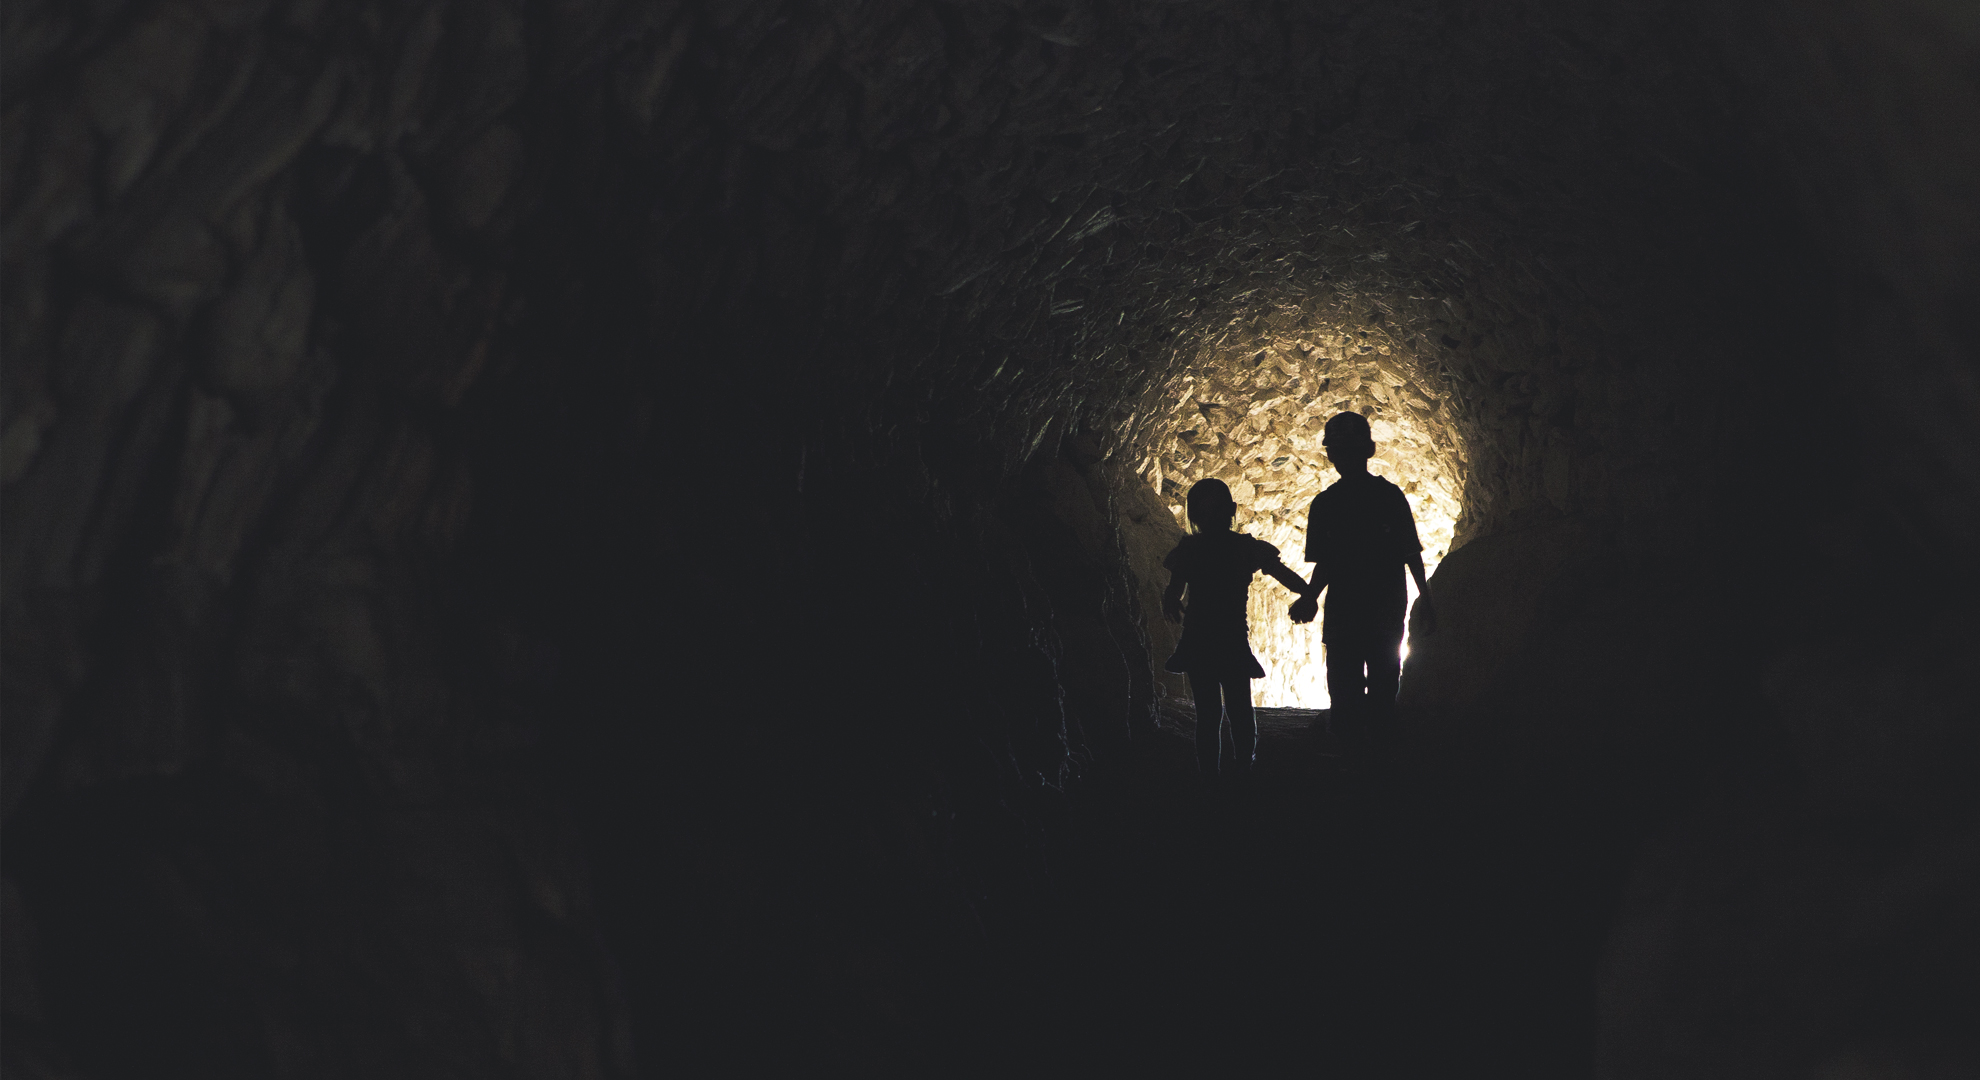 Suomenlinnan tunnelit